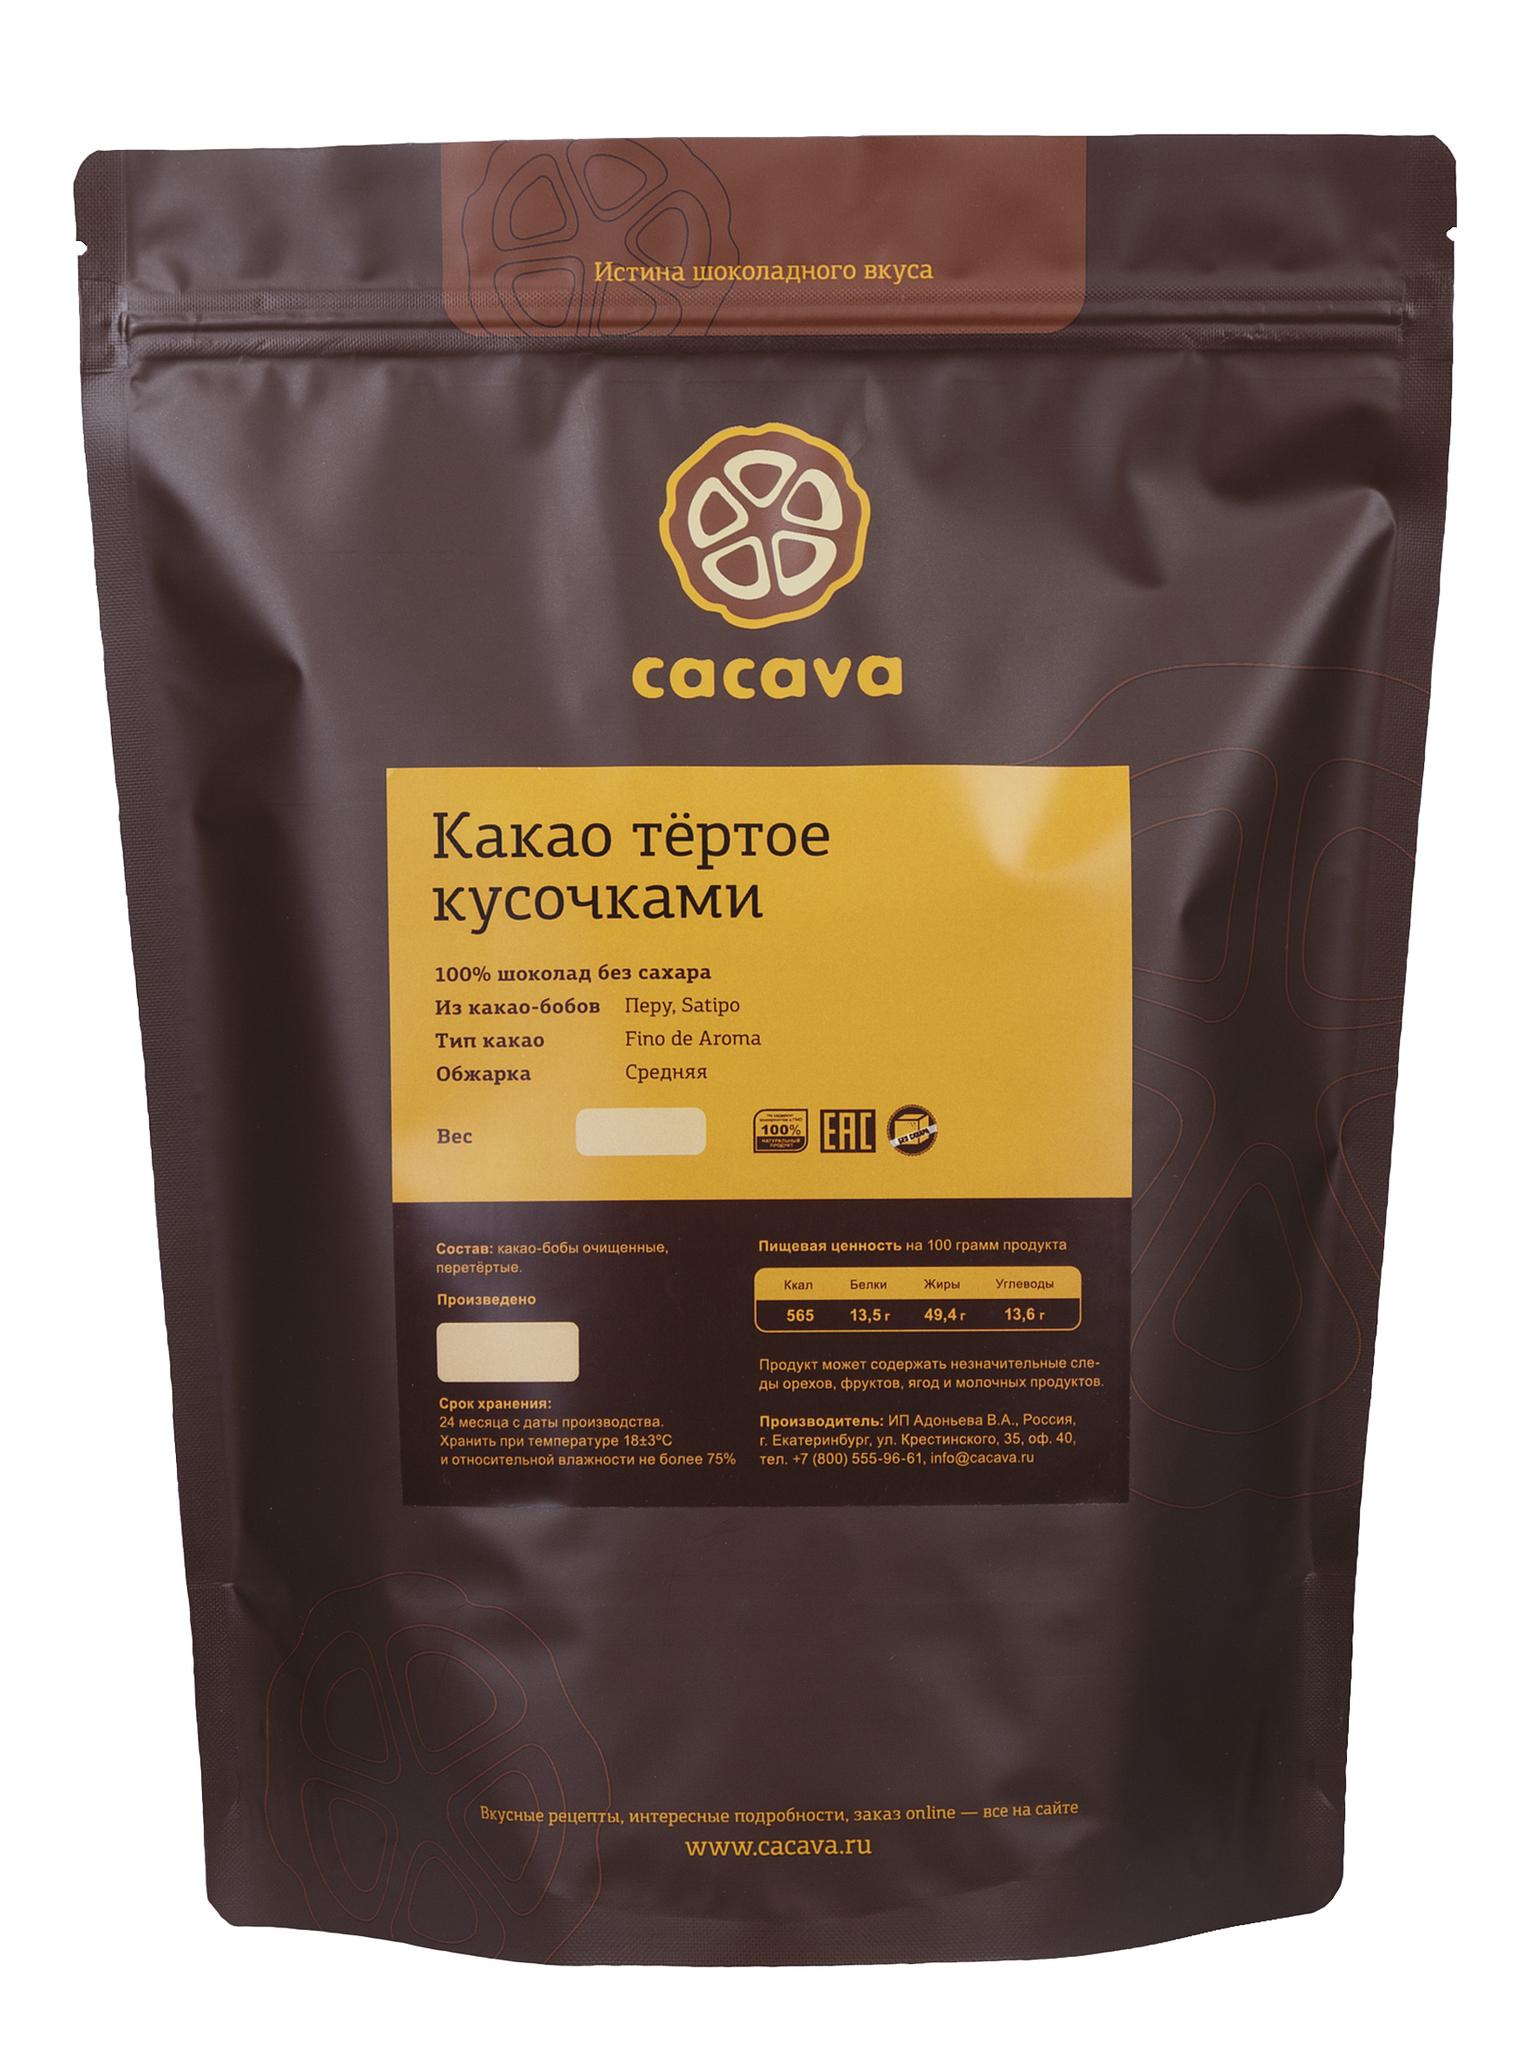 Какао тёртое кусочками (Перу, Organic Satipo), упаковка 1 кг